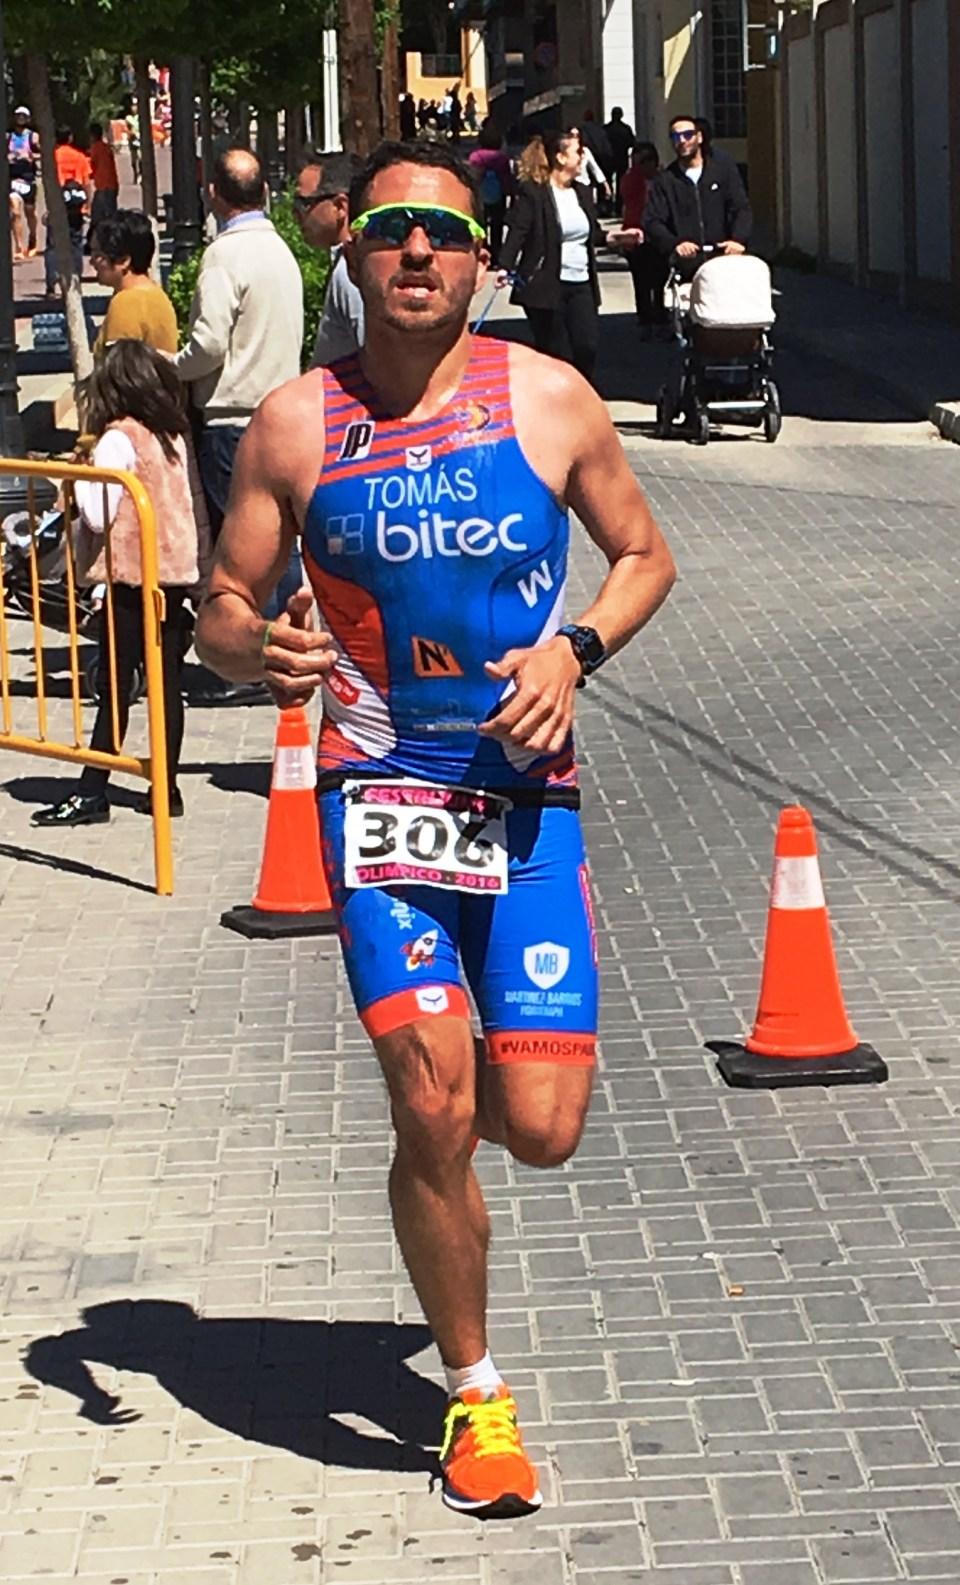 Nacho Tomás - Festrijump 2016 - triatlon olimpico de Jumilla